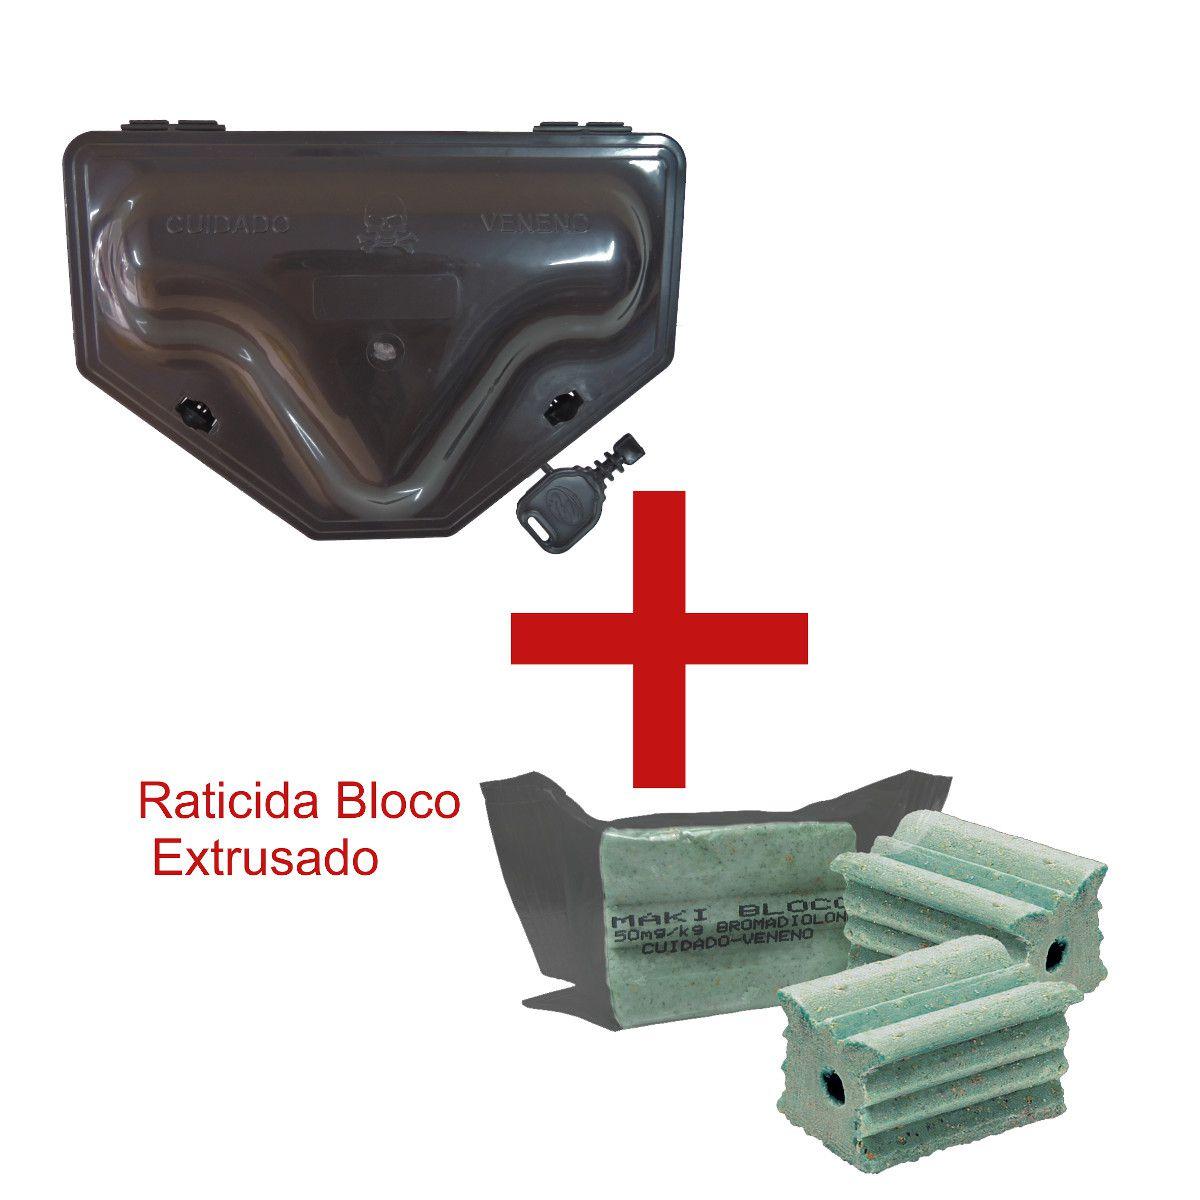 KIT 4 Porta Iscas Armadilha Pega Ratos 2 TRAVAS c/ Chave